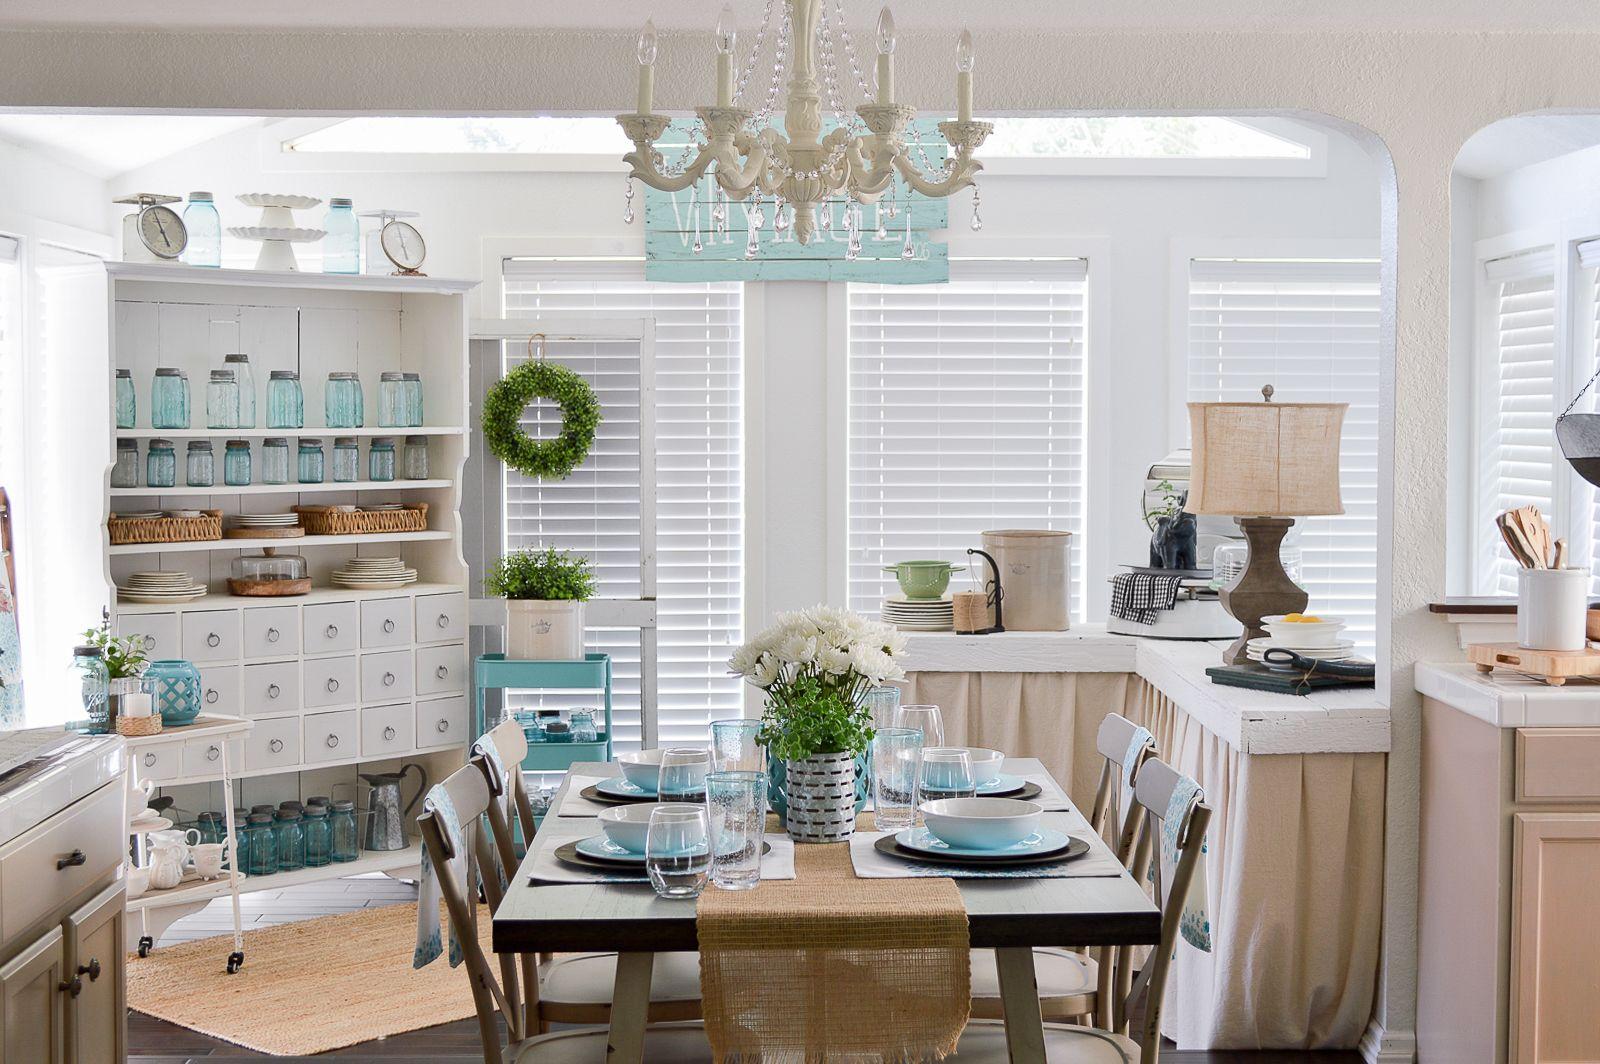 Farmhouse Style Decorating with Color Home decor, Decor